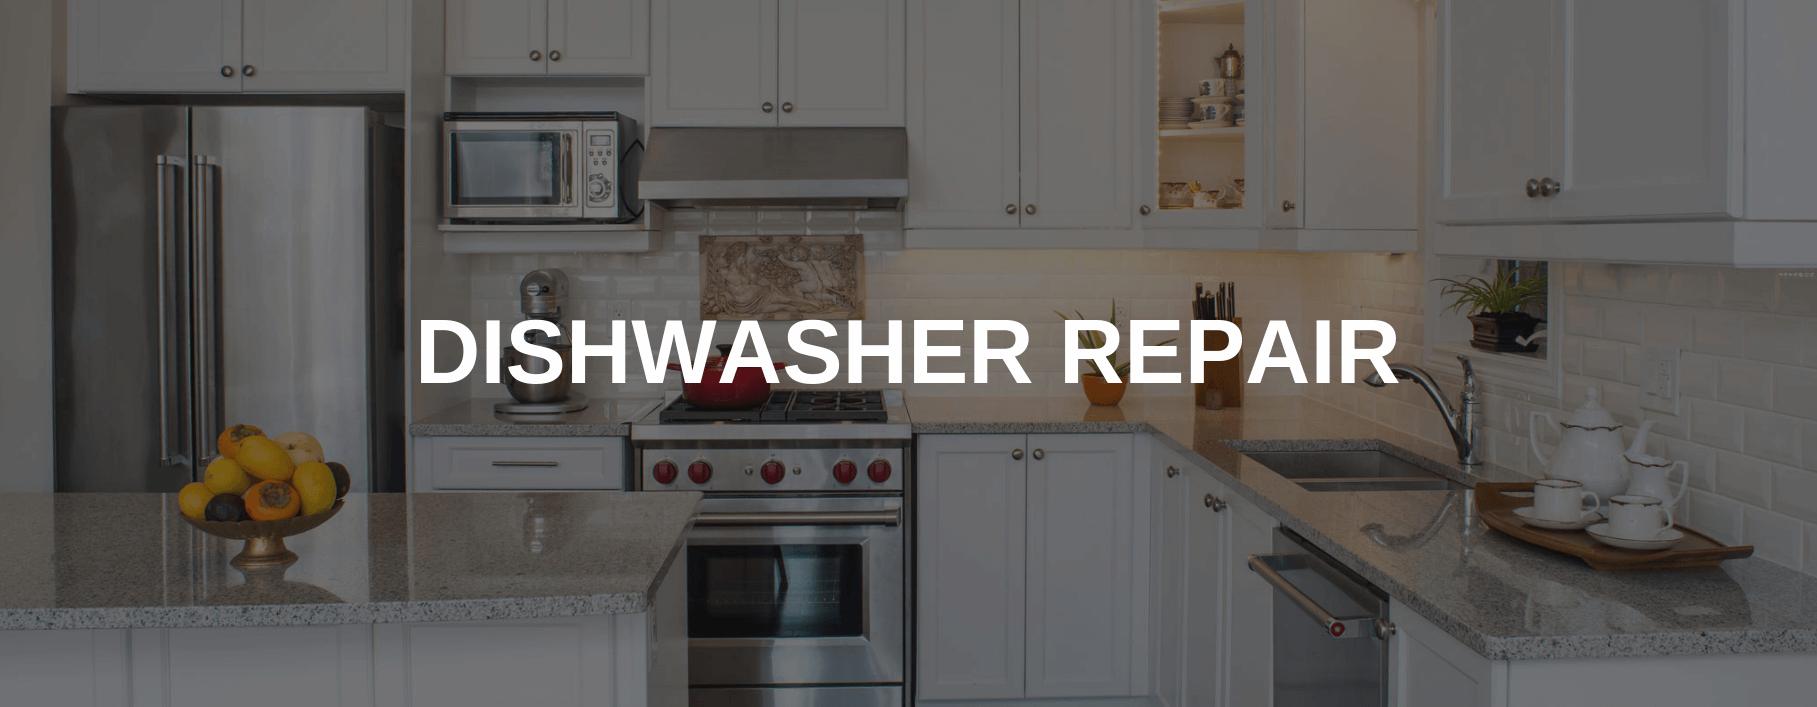 dishwasher repair bellevue